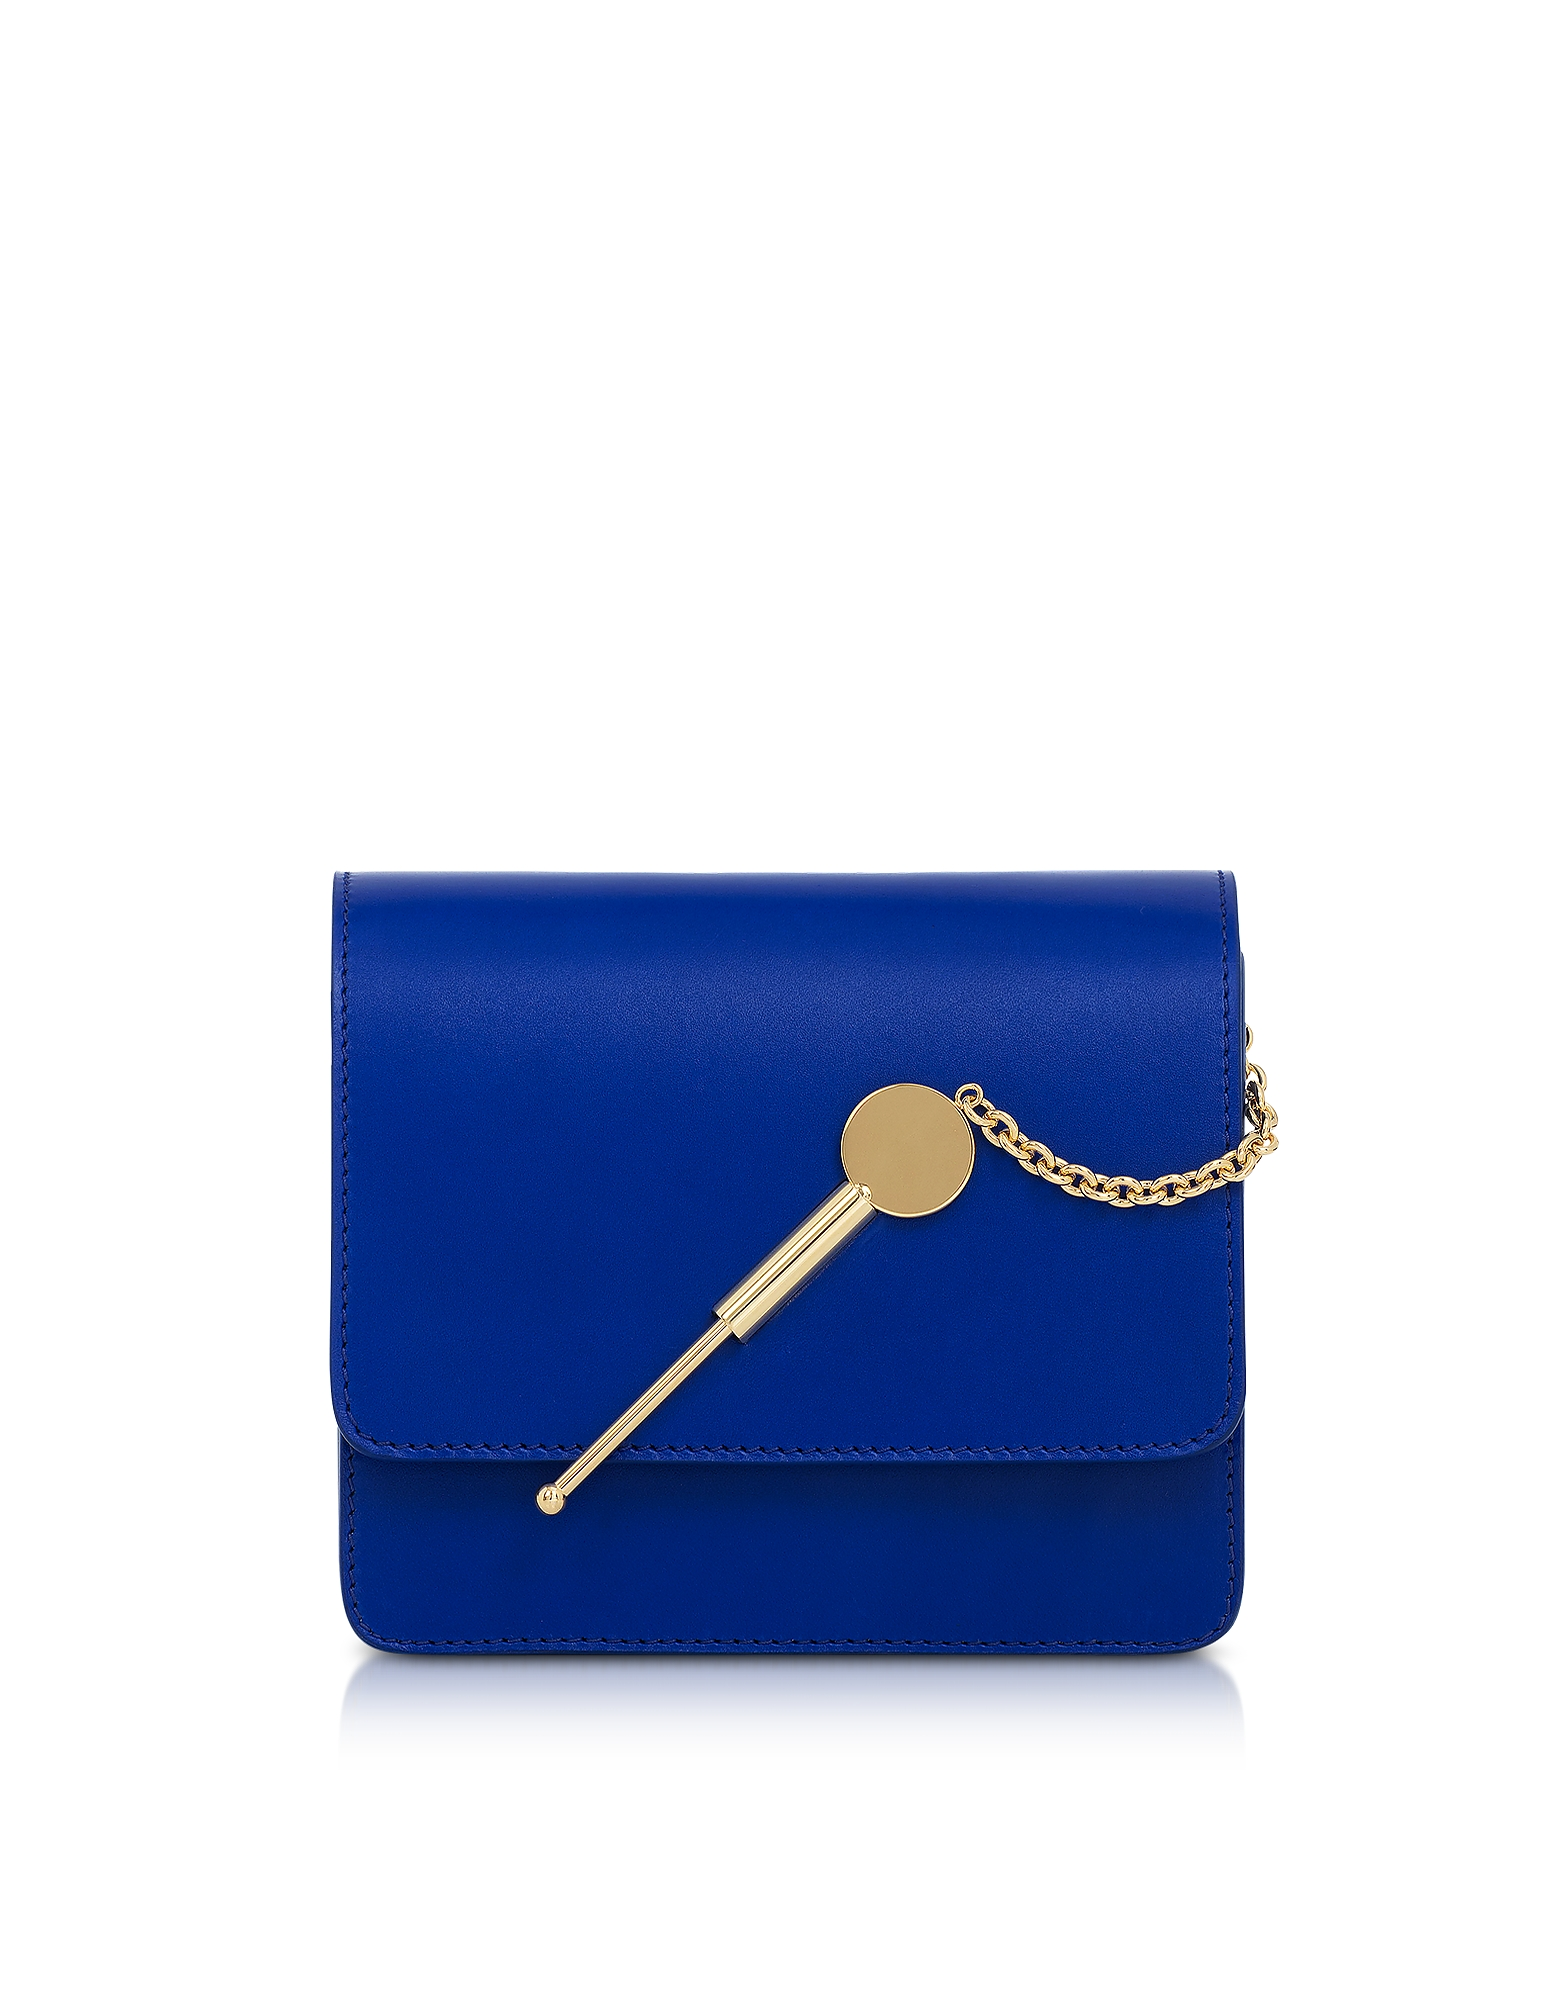 Sophie Hulme Handbags, Klein Blue Small Cocktail Stirrer Bag